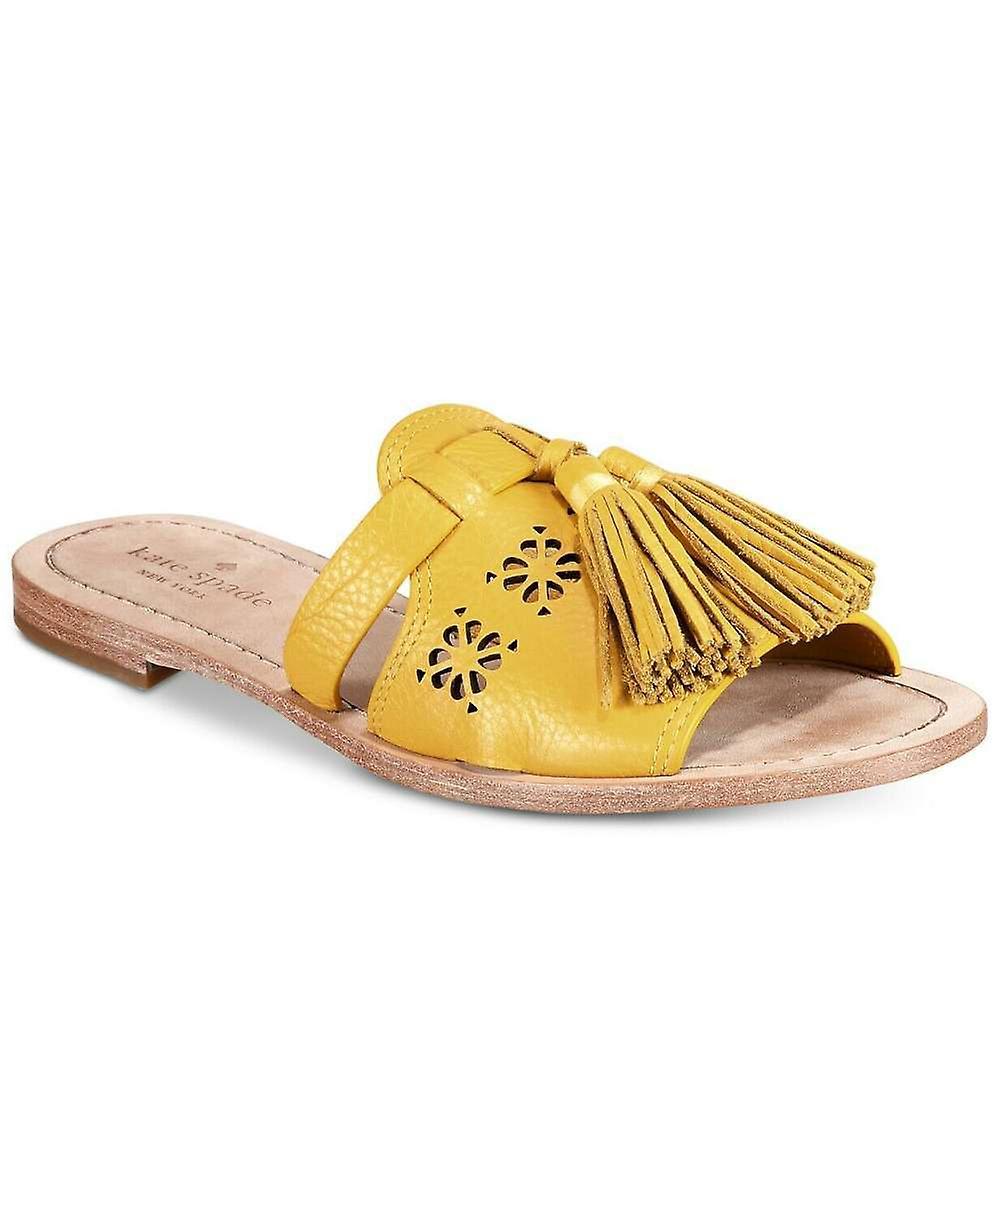 Kate Spade New York Kobiety Claire Fabric Open Toe Walking Slide Sandały EUUXU